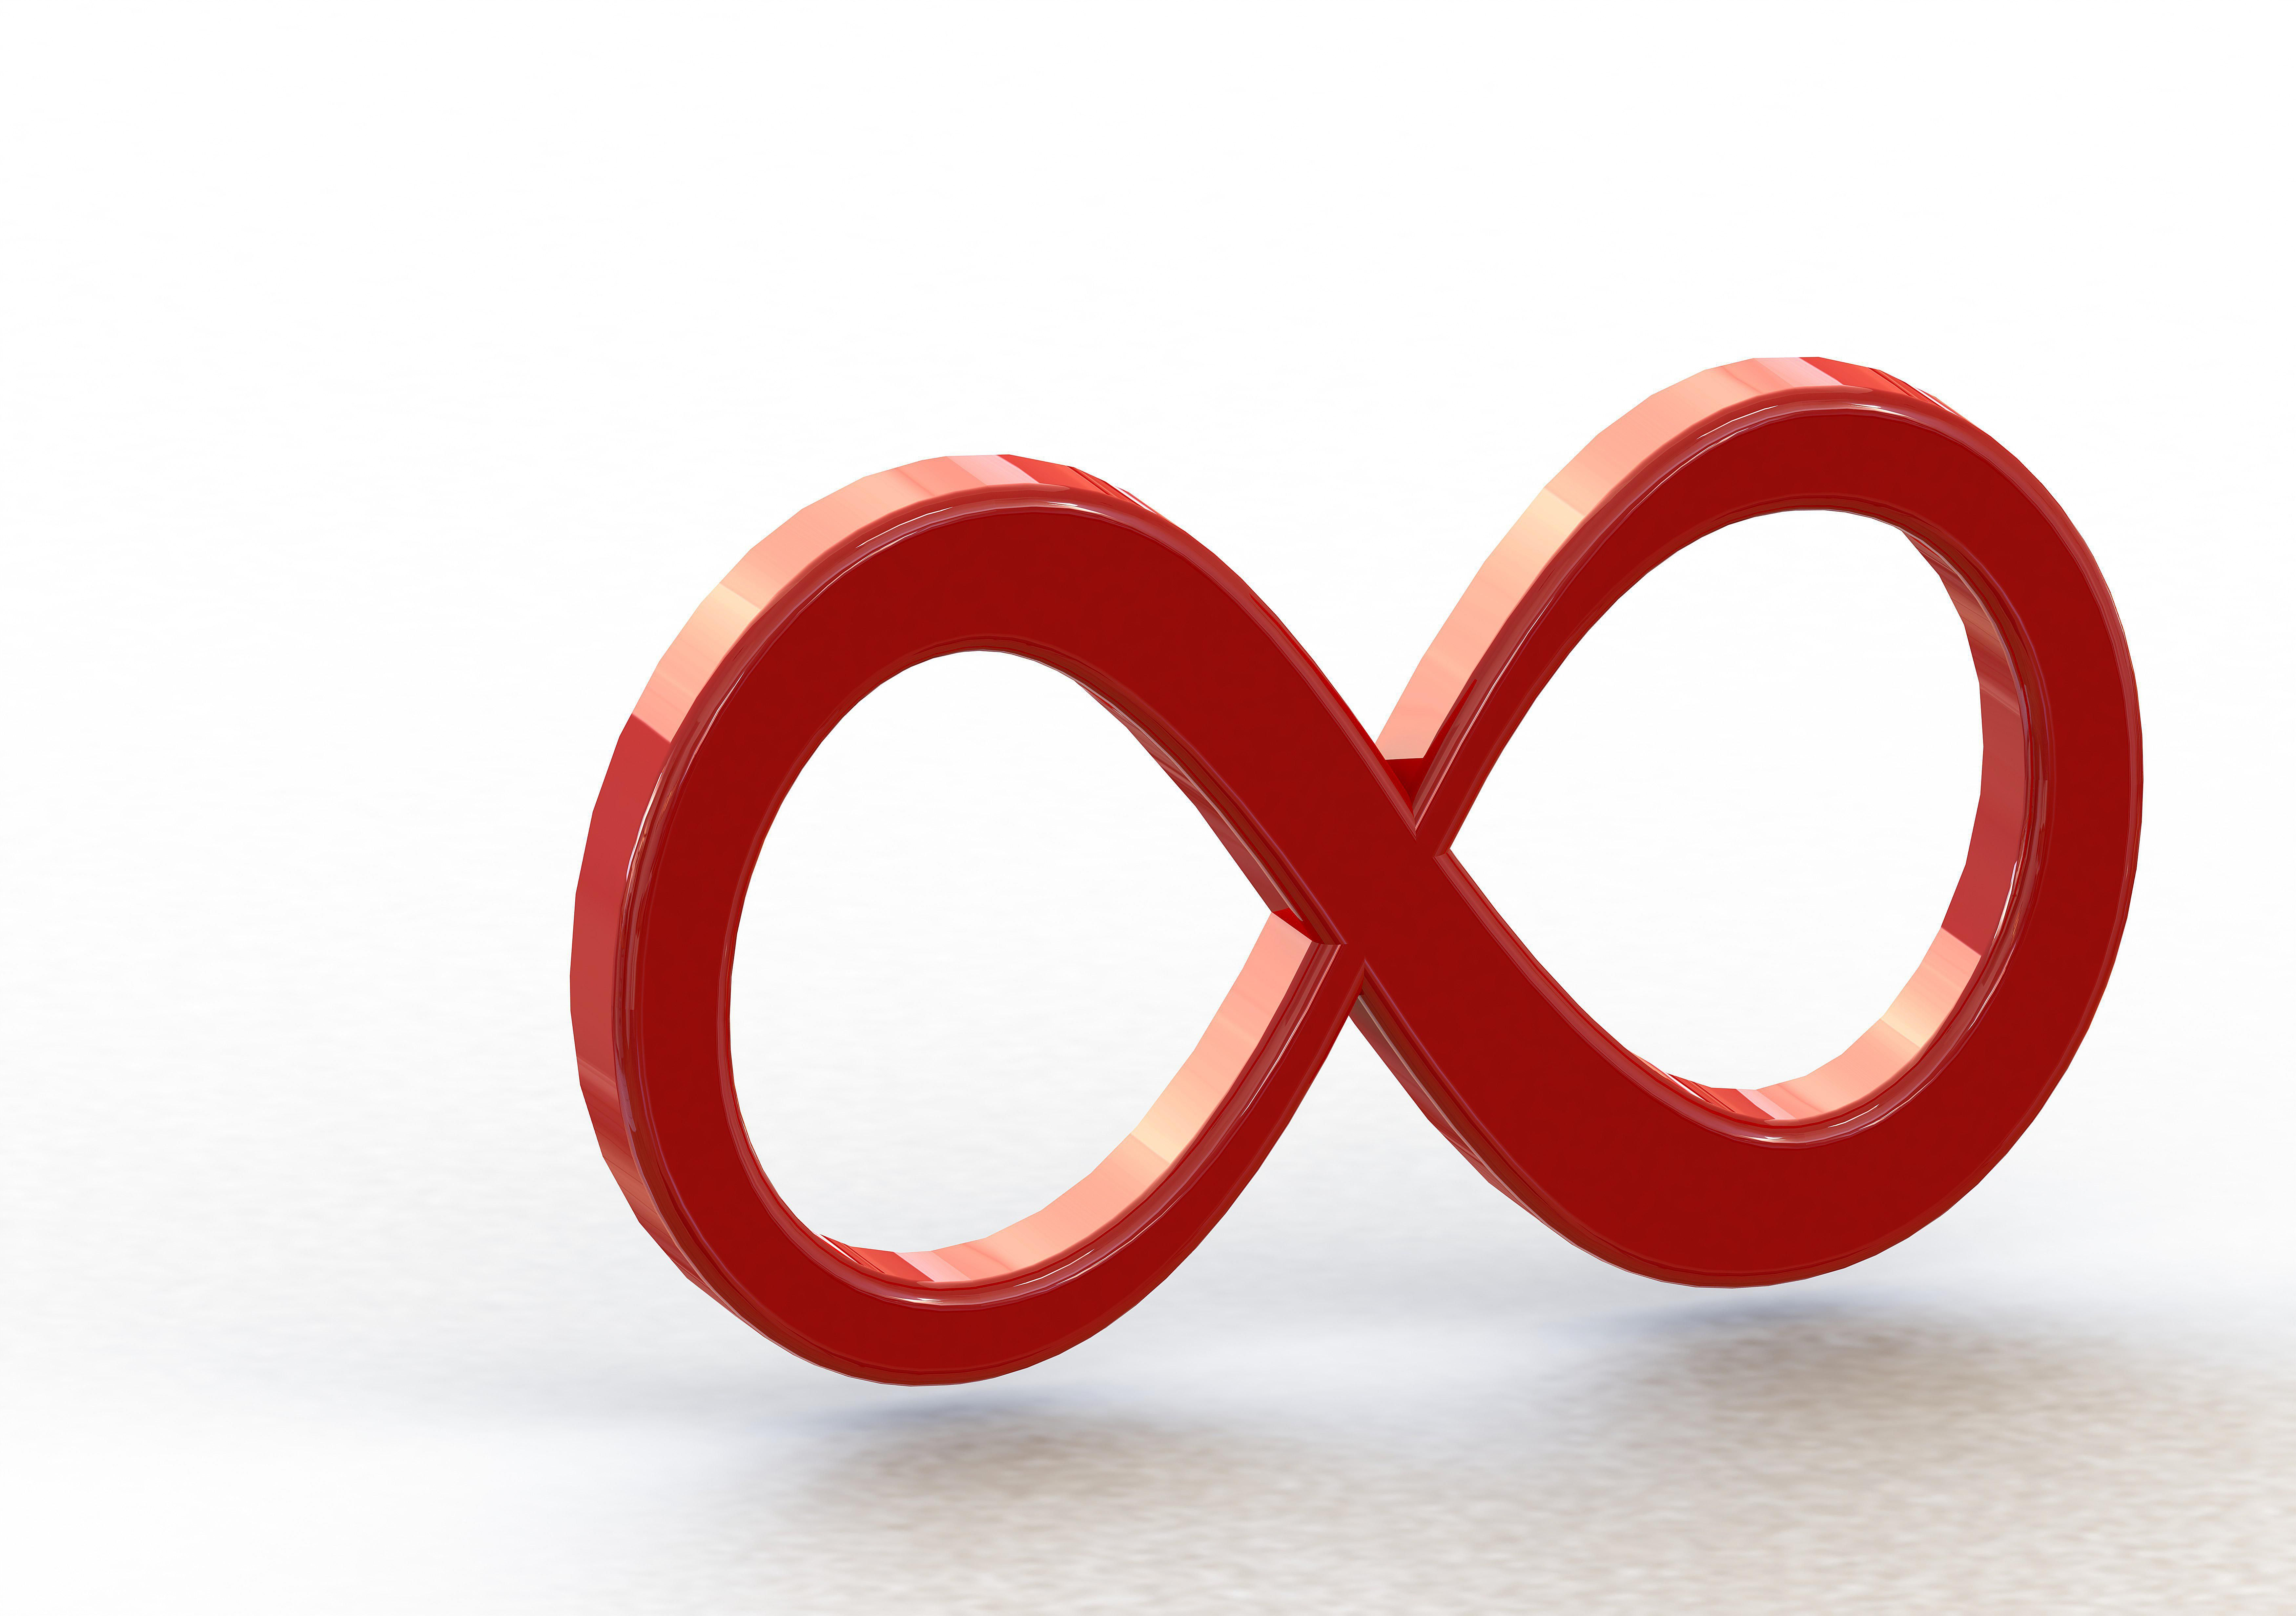 Infinity AdobeStock_37602413